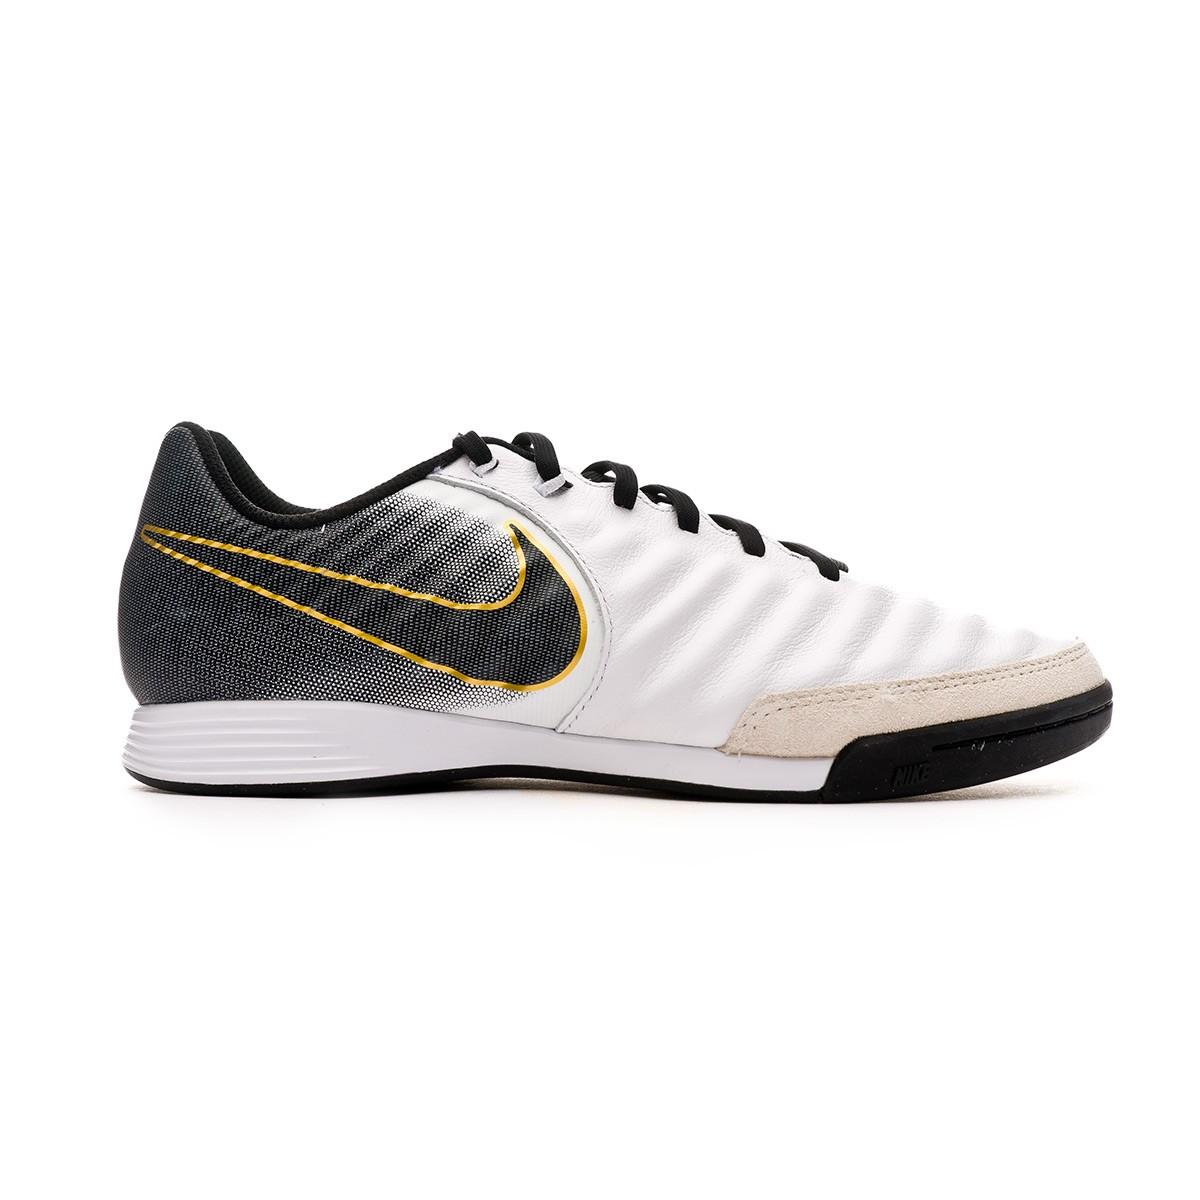 Sapatilha de Futsal Nike Tiempo LegendX VII Academy IC